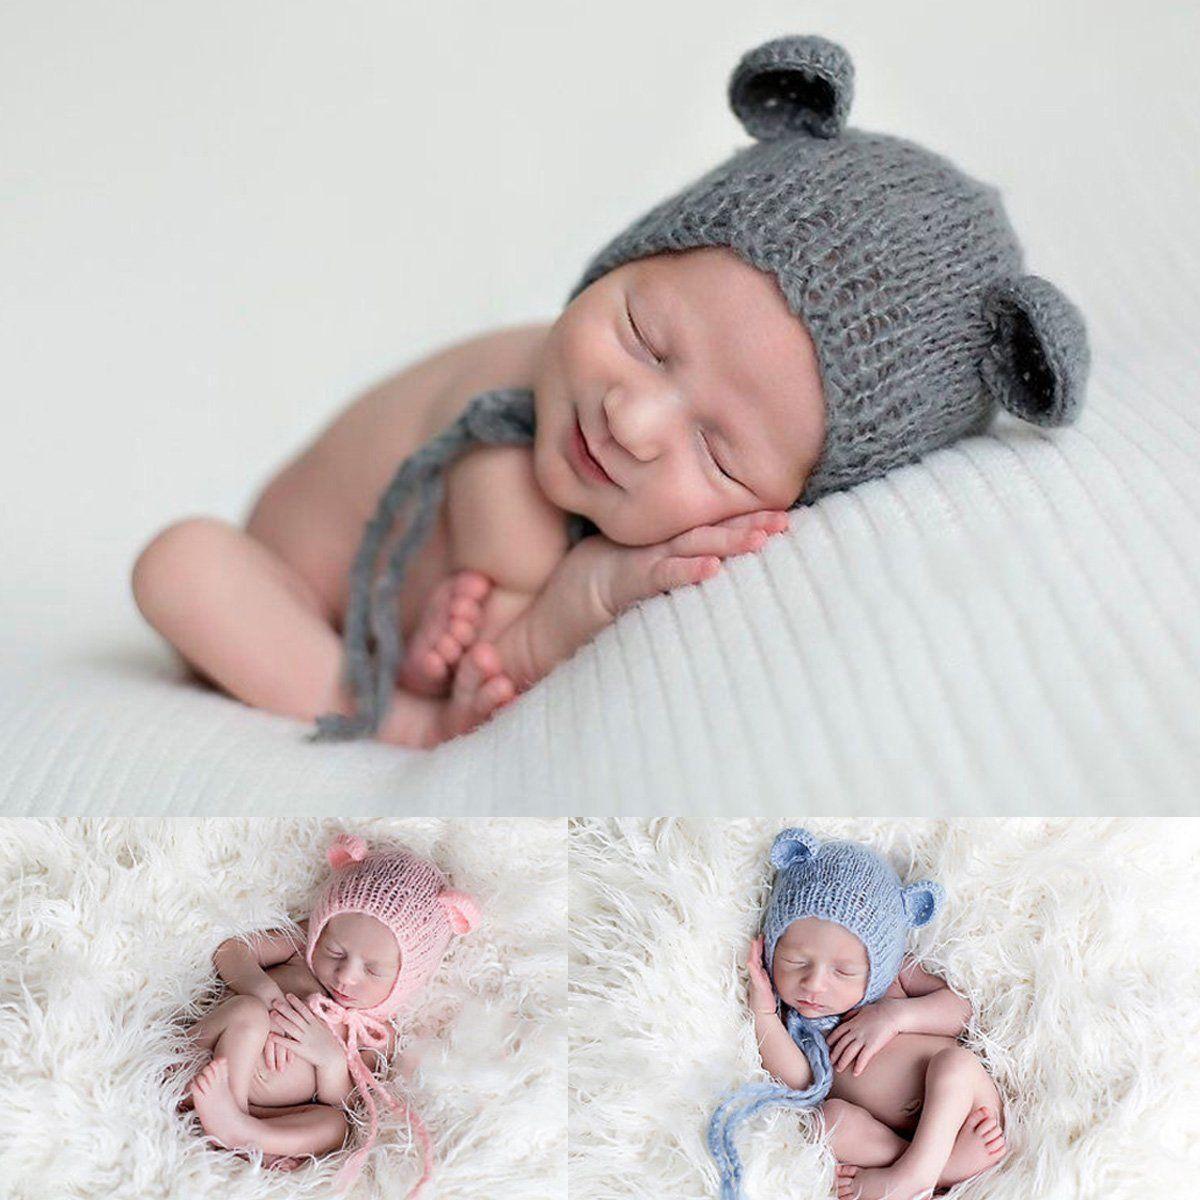 Newborn Photography Props |Baby Boy Newborn Photography Props